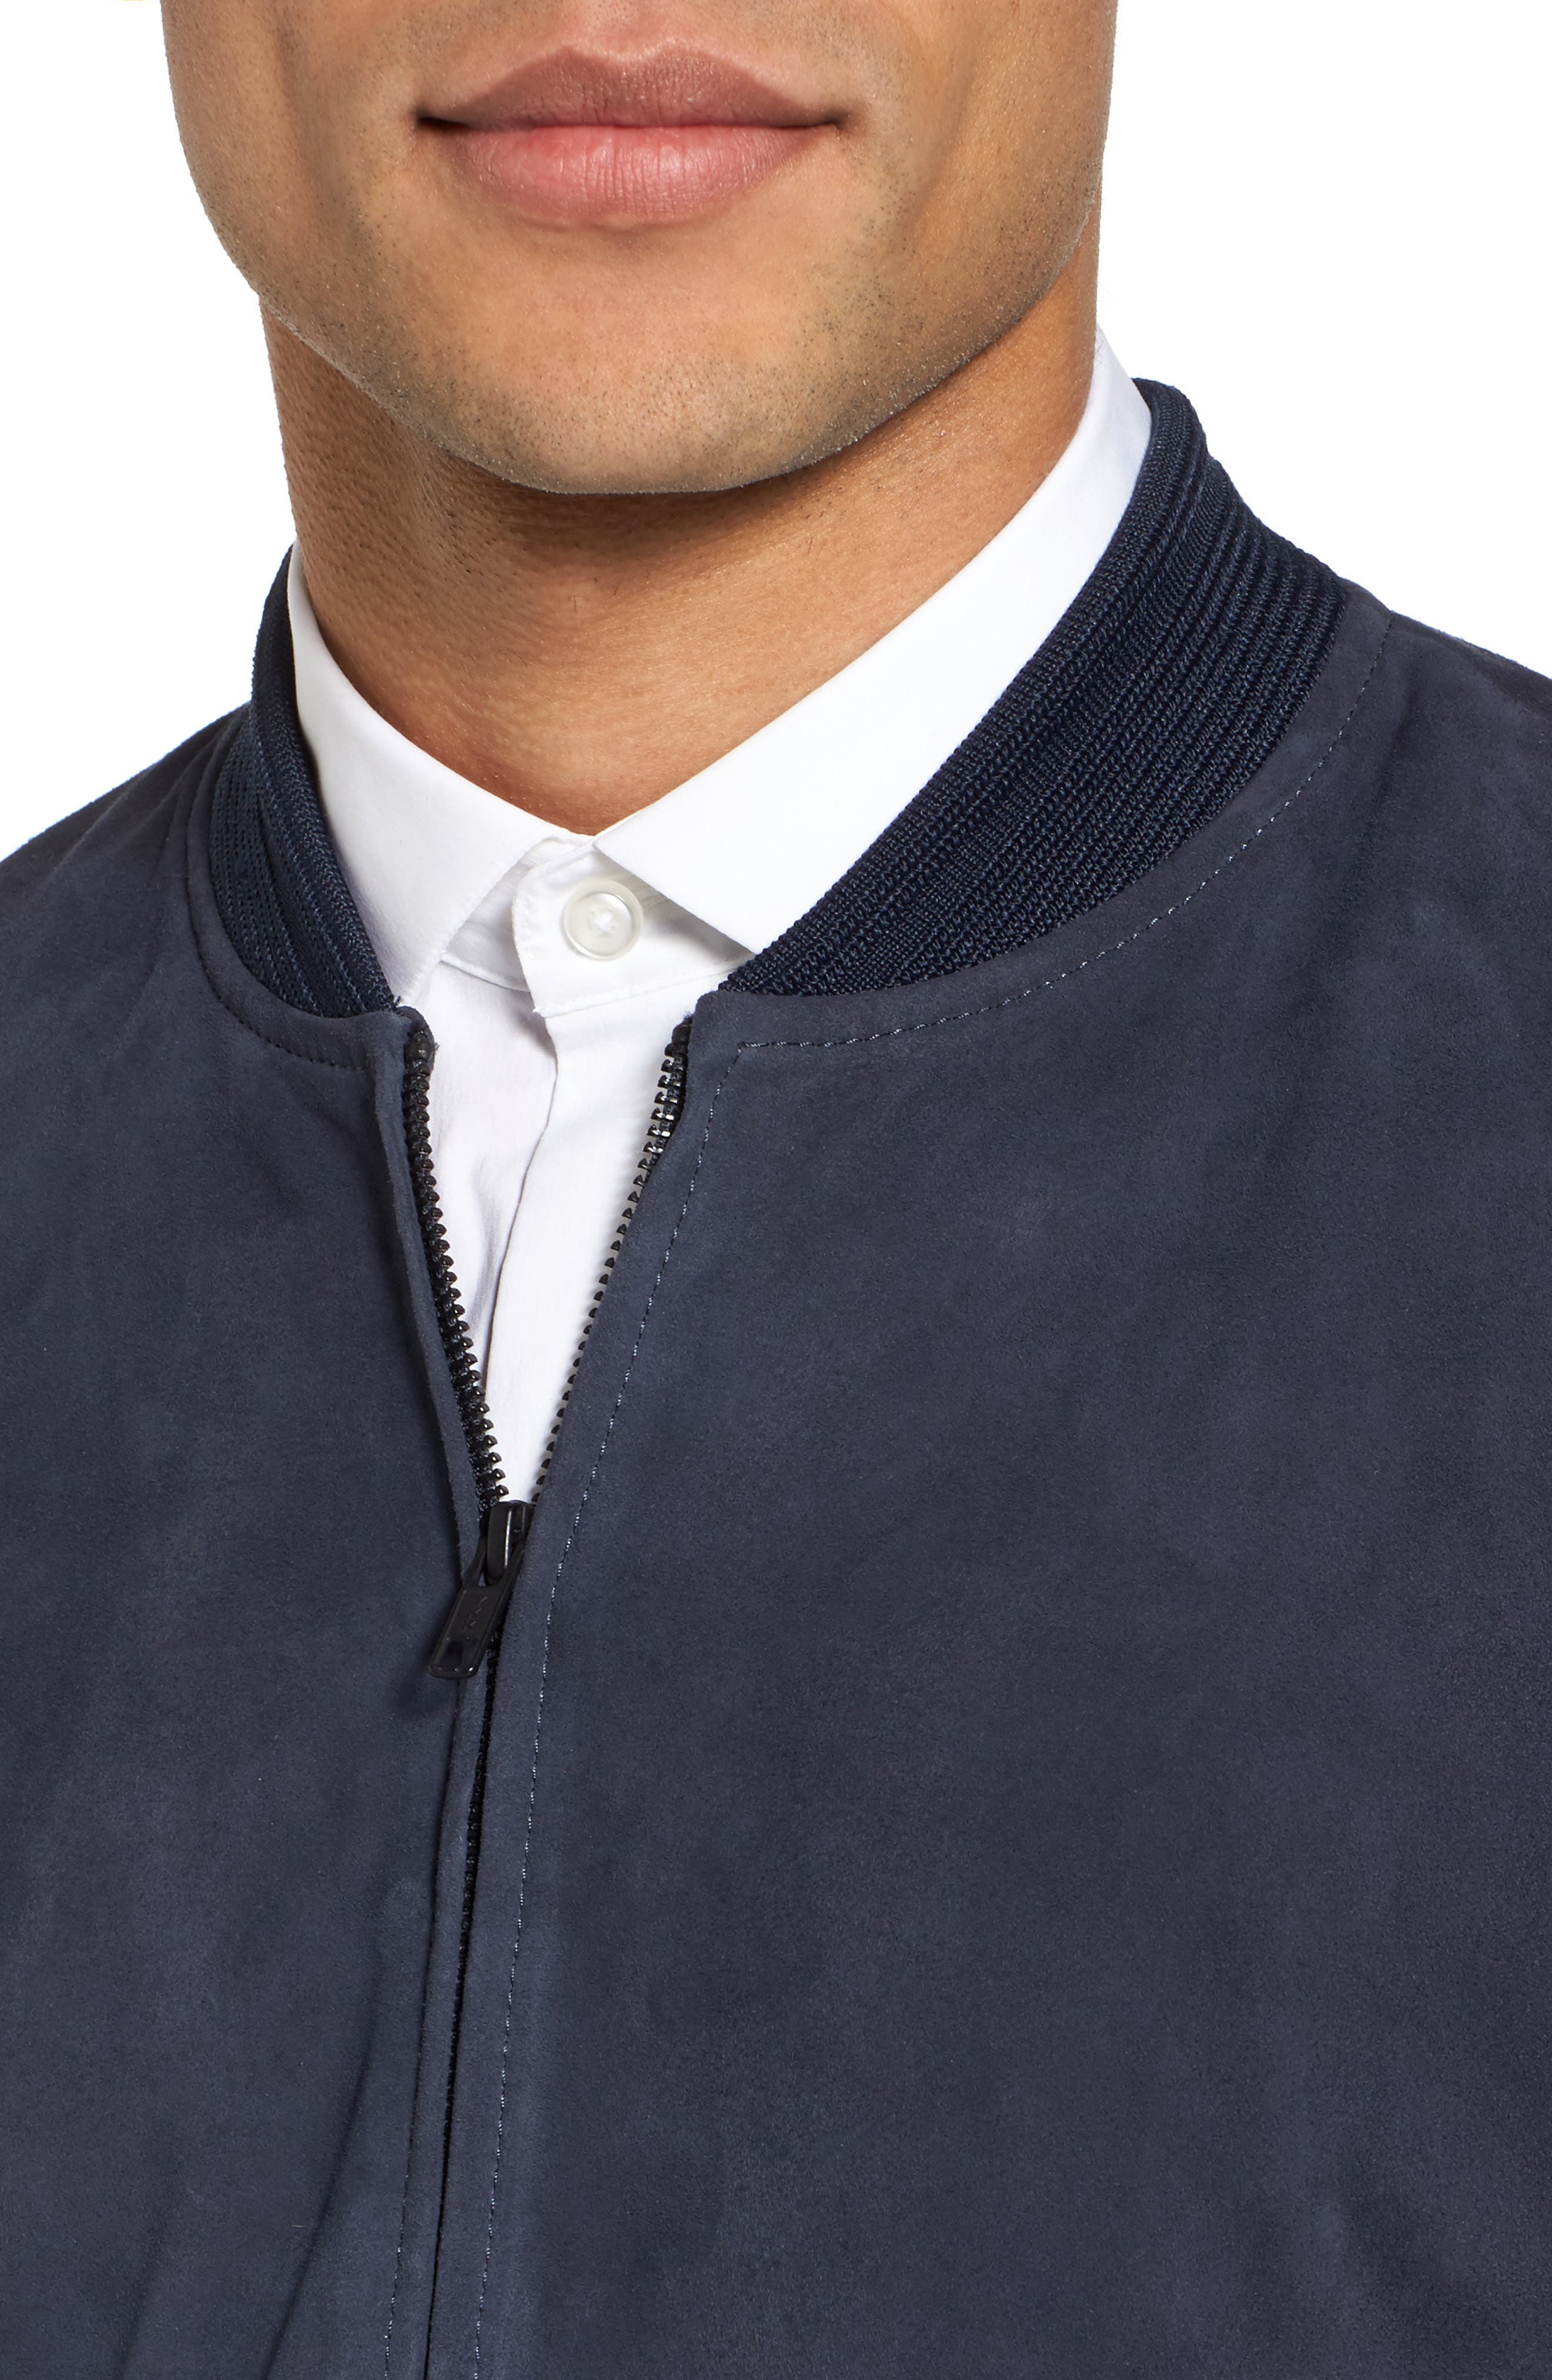 Suede Bomber Jacket,                             Alternate thumbnail 4, color,                             Navy Blue